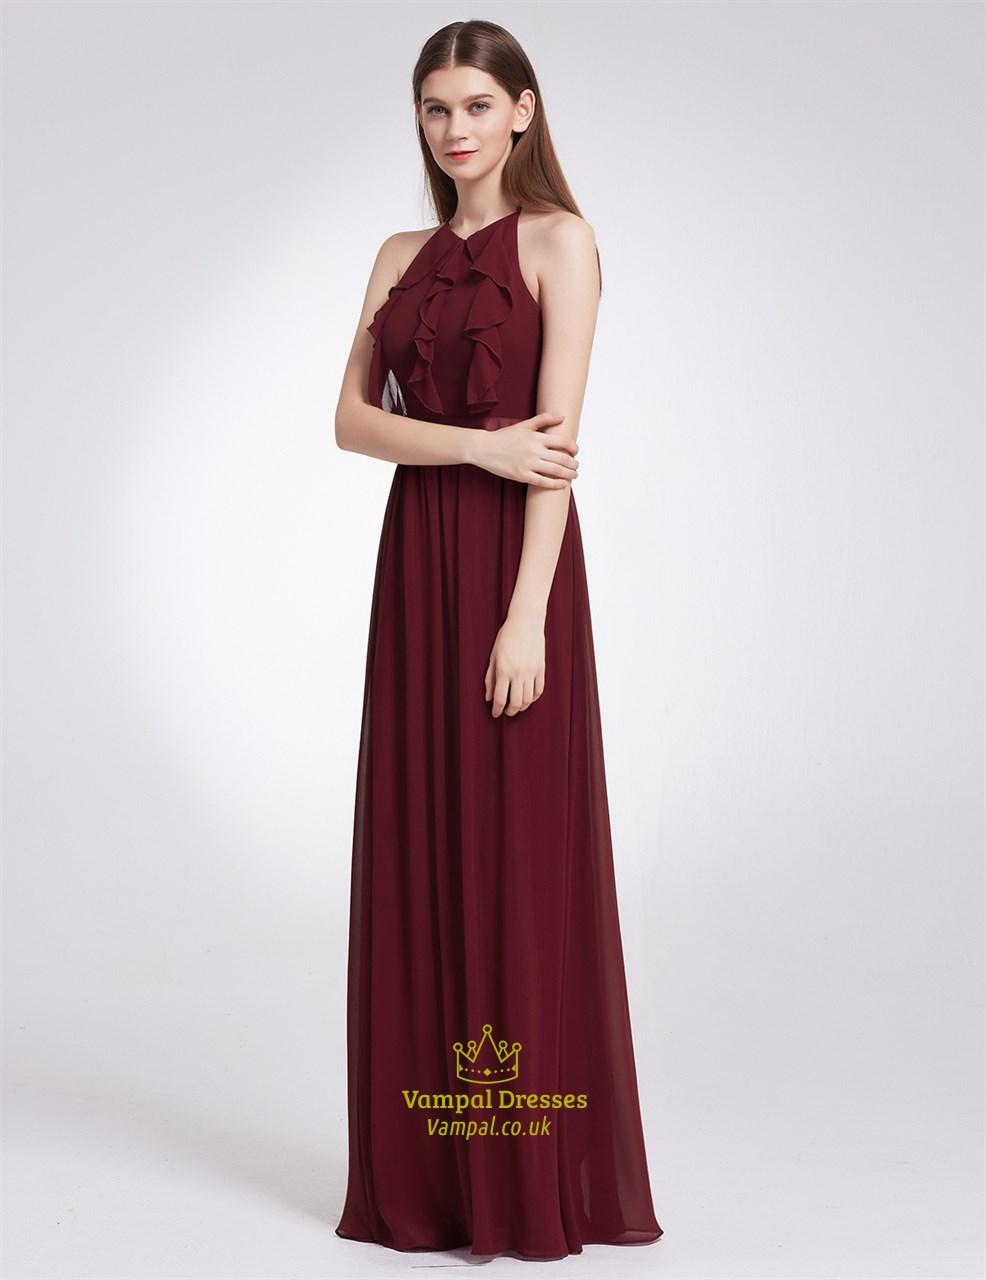 b59754e62479 Burgundy A-Line Halter Neck Chiffon Open Back Long Maxi Dress With Ruffles  SKU -FS2893-BD